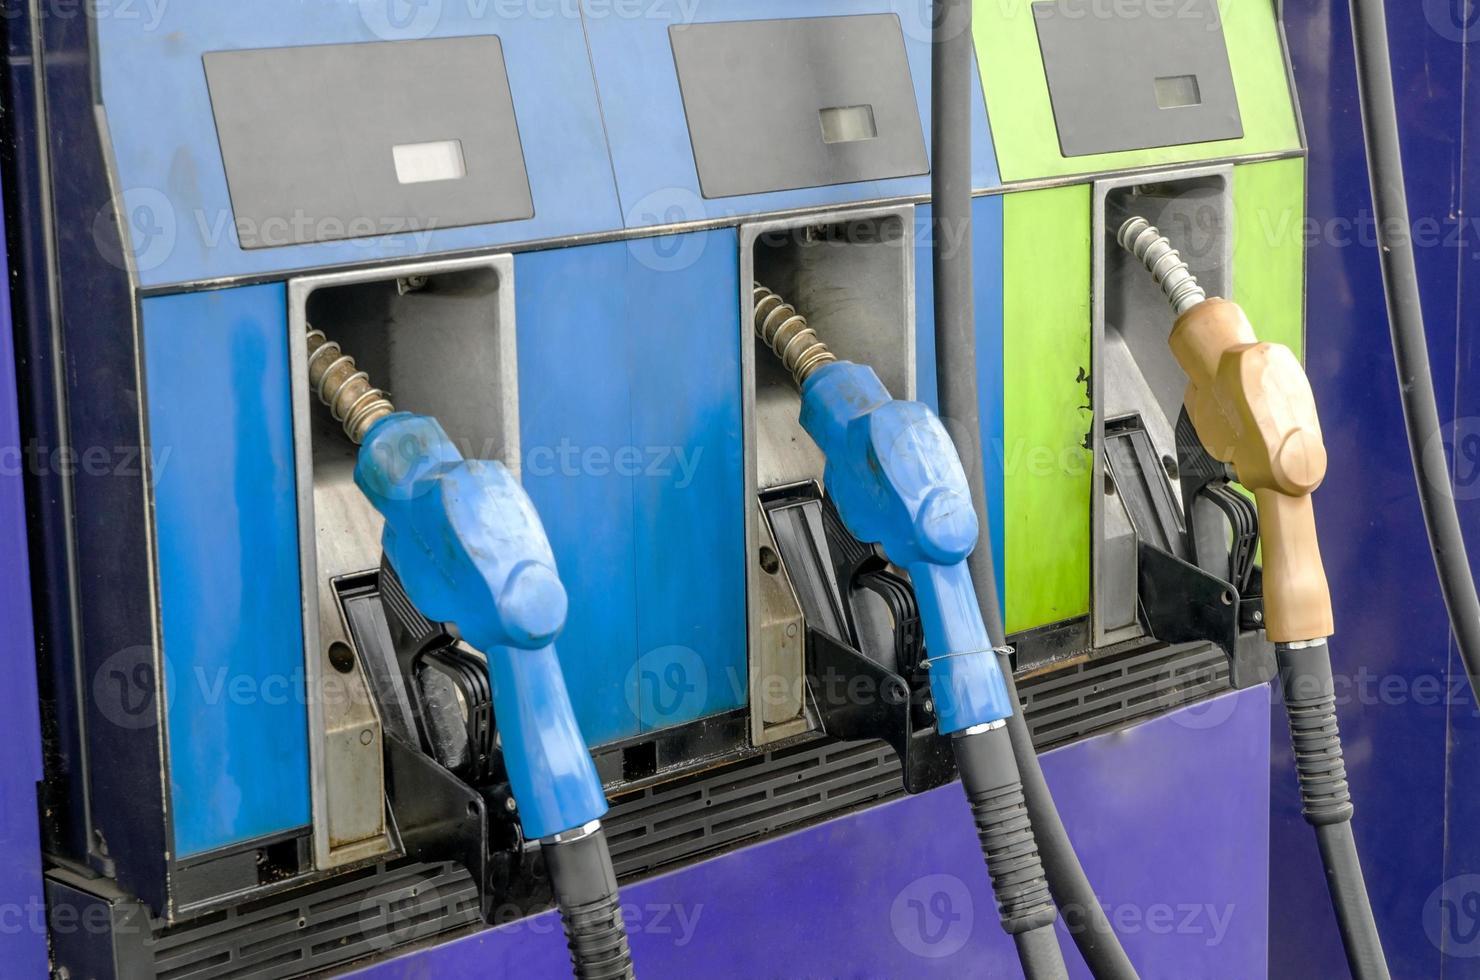 Four petrol pumps, close up photo